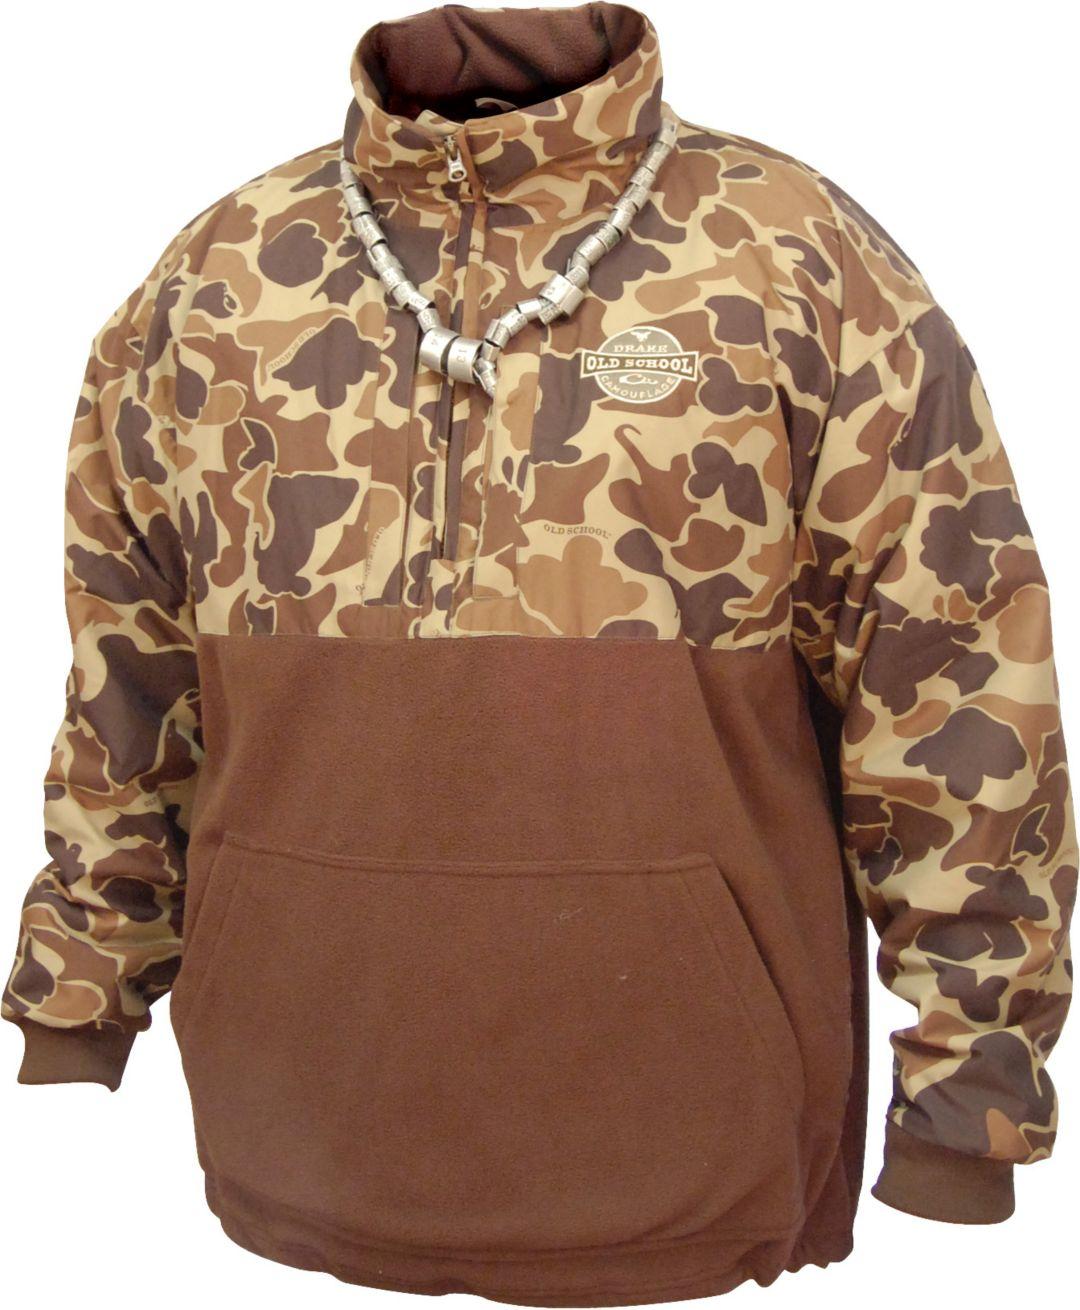 9edde572e4c44 Drake Waterfowl Men's MST Eqwader Quarter Zip Hunting Jacket | Field ...